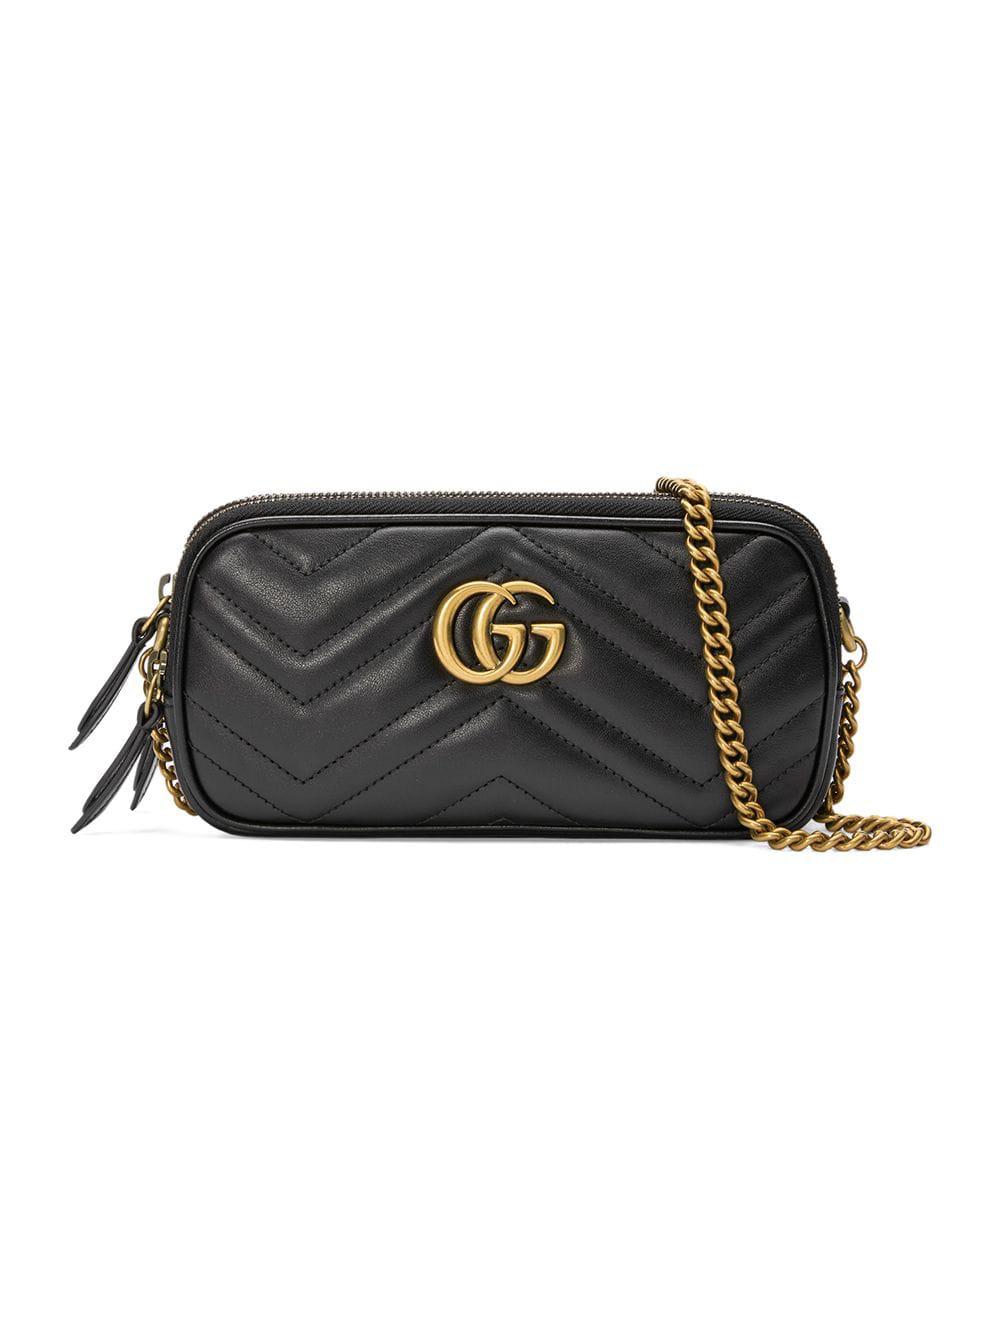 3a118be2fb6 Gucci Gg Marmont Mini Chain Bag - Black